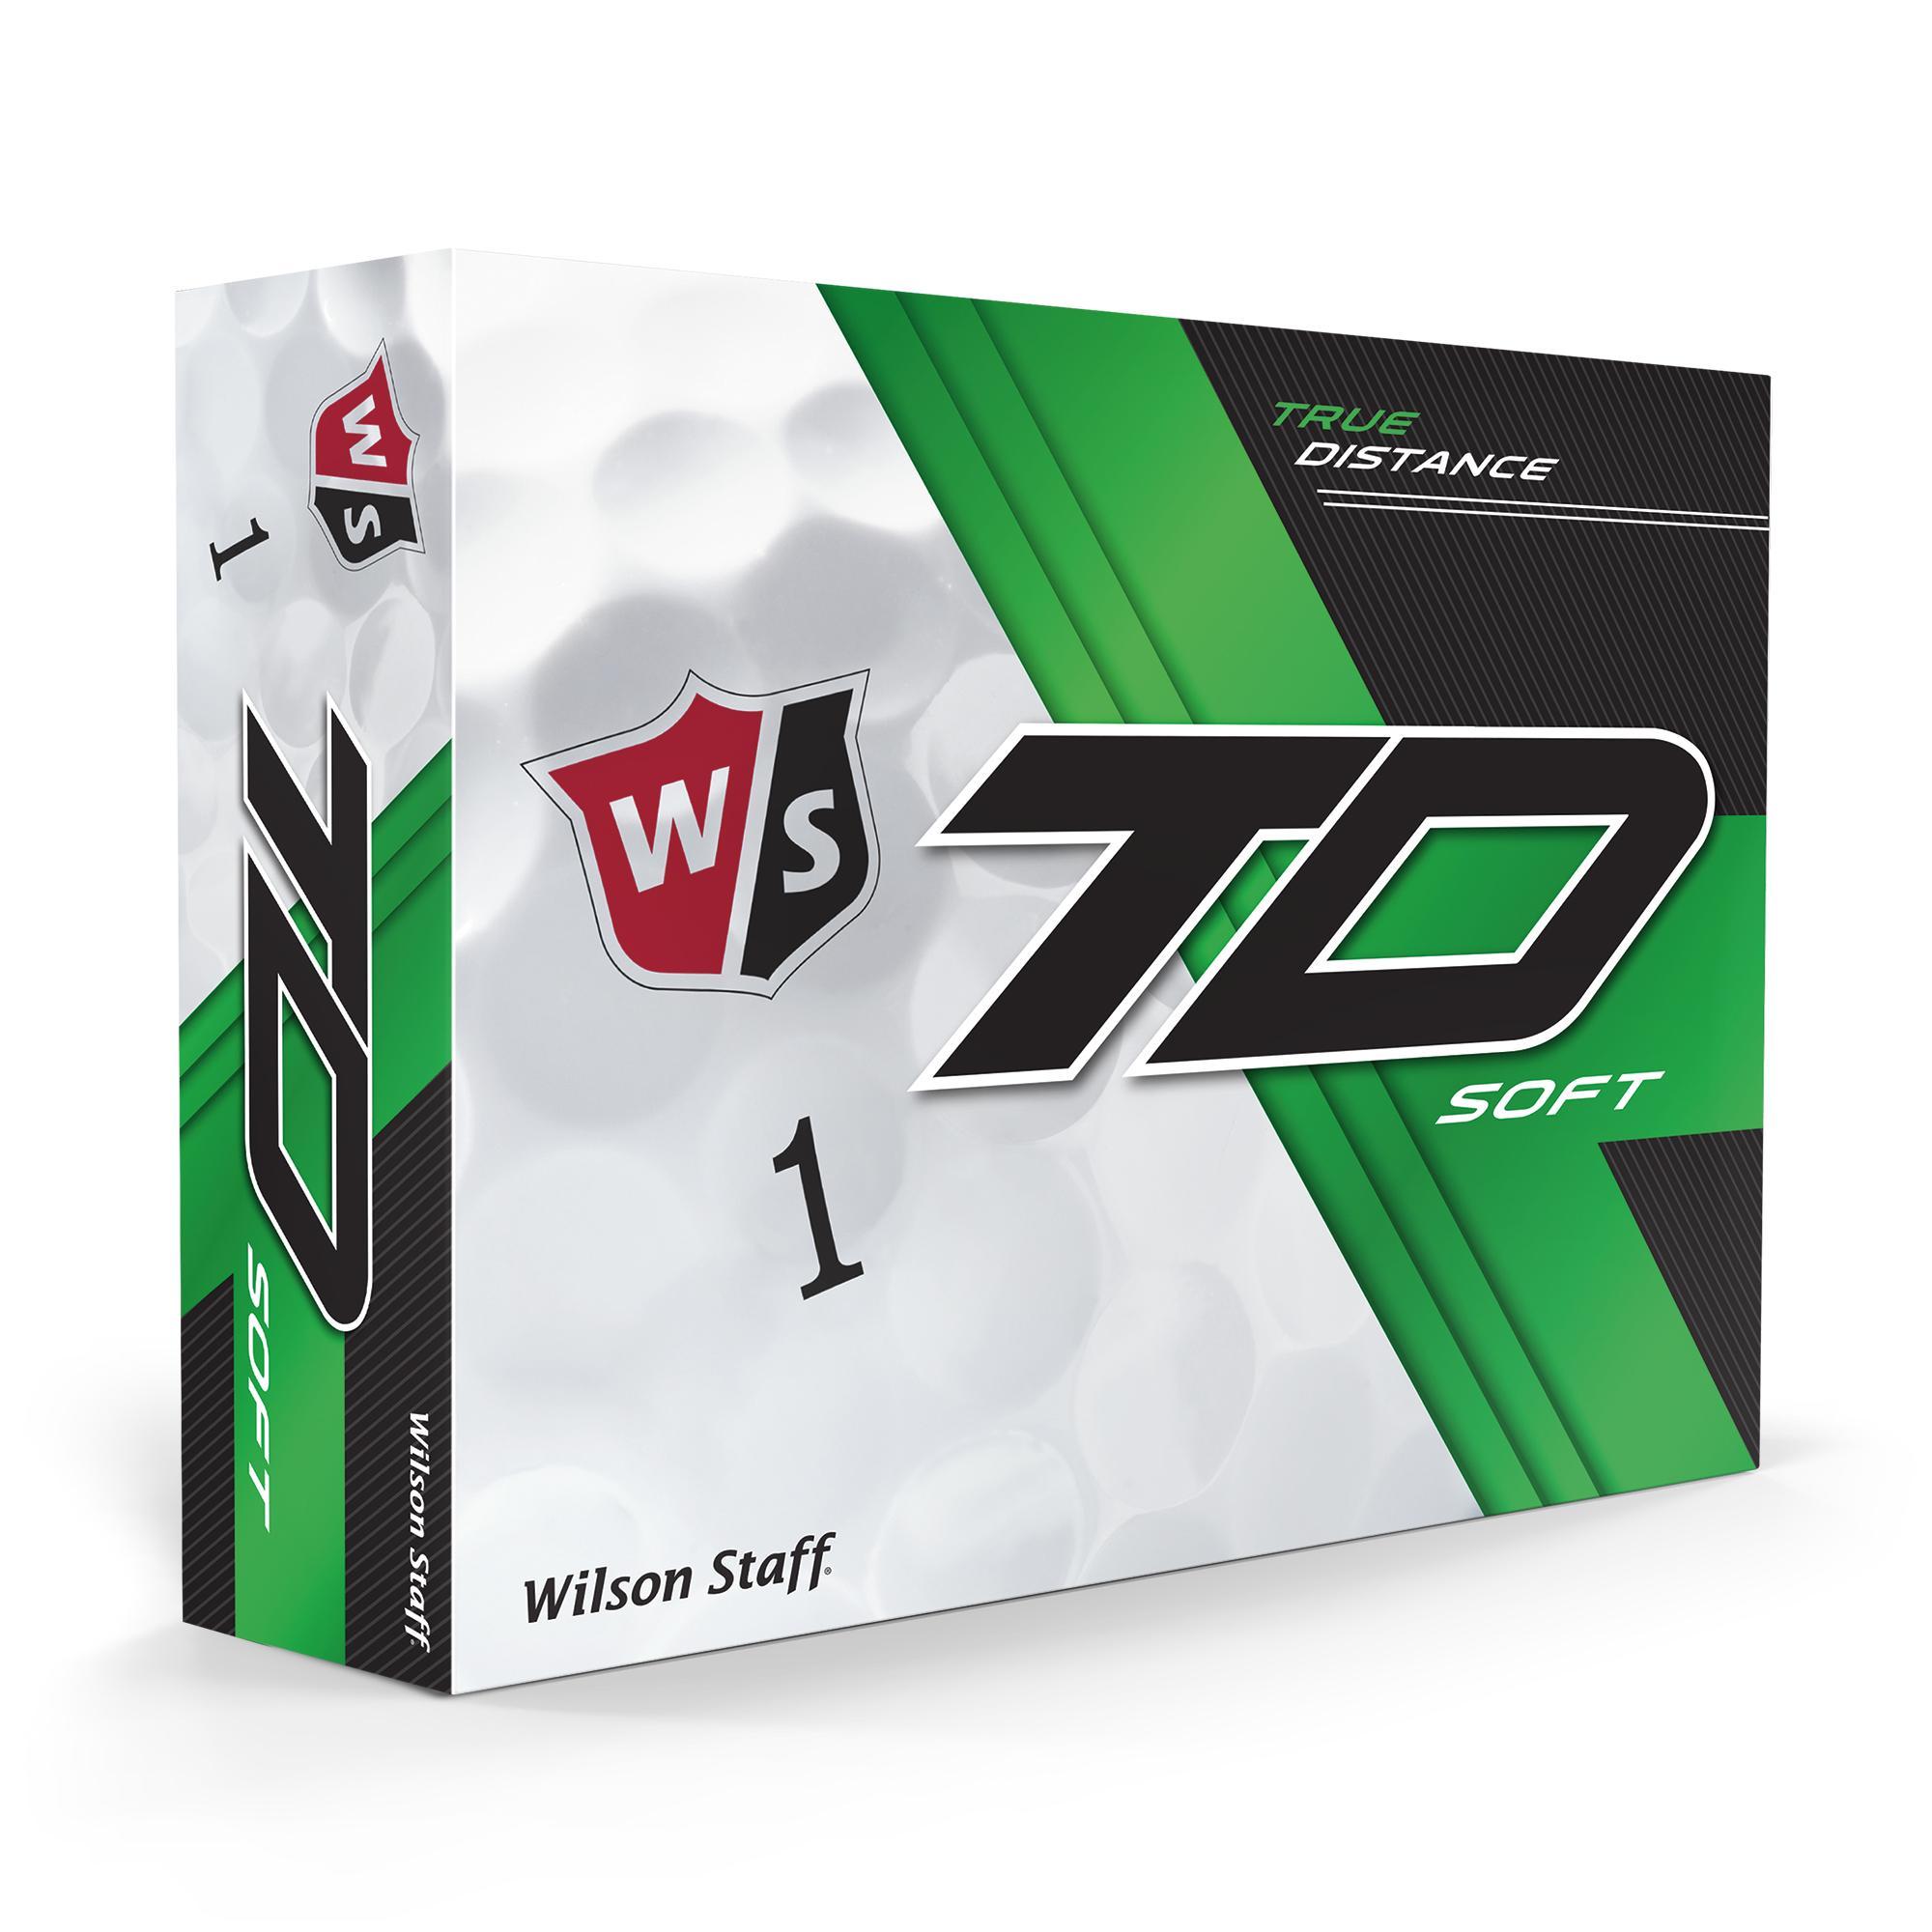 Amazon.com : Wilson True Distance W/S True Distance Soft or 12-Ball ...